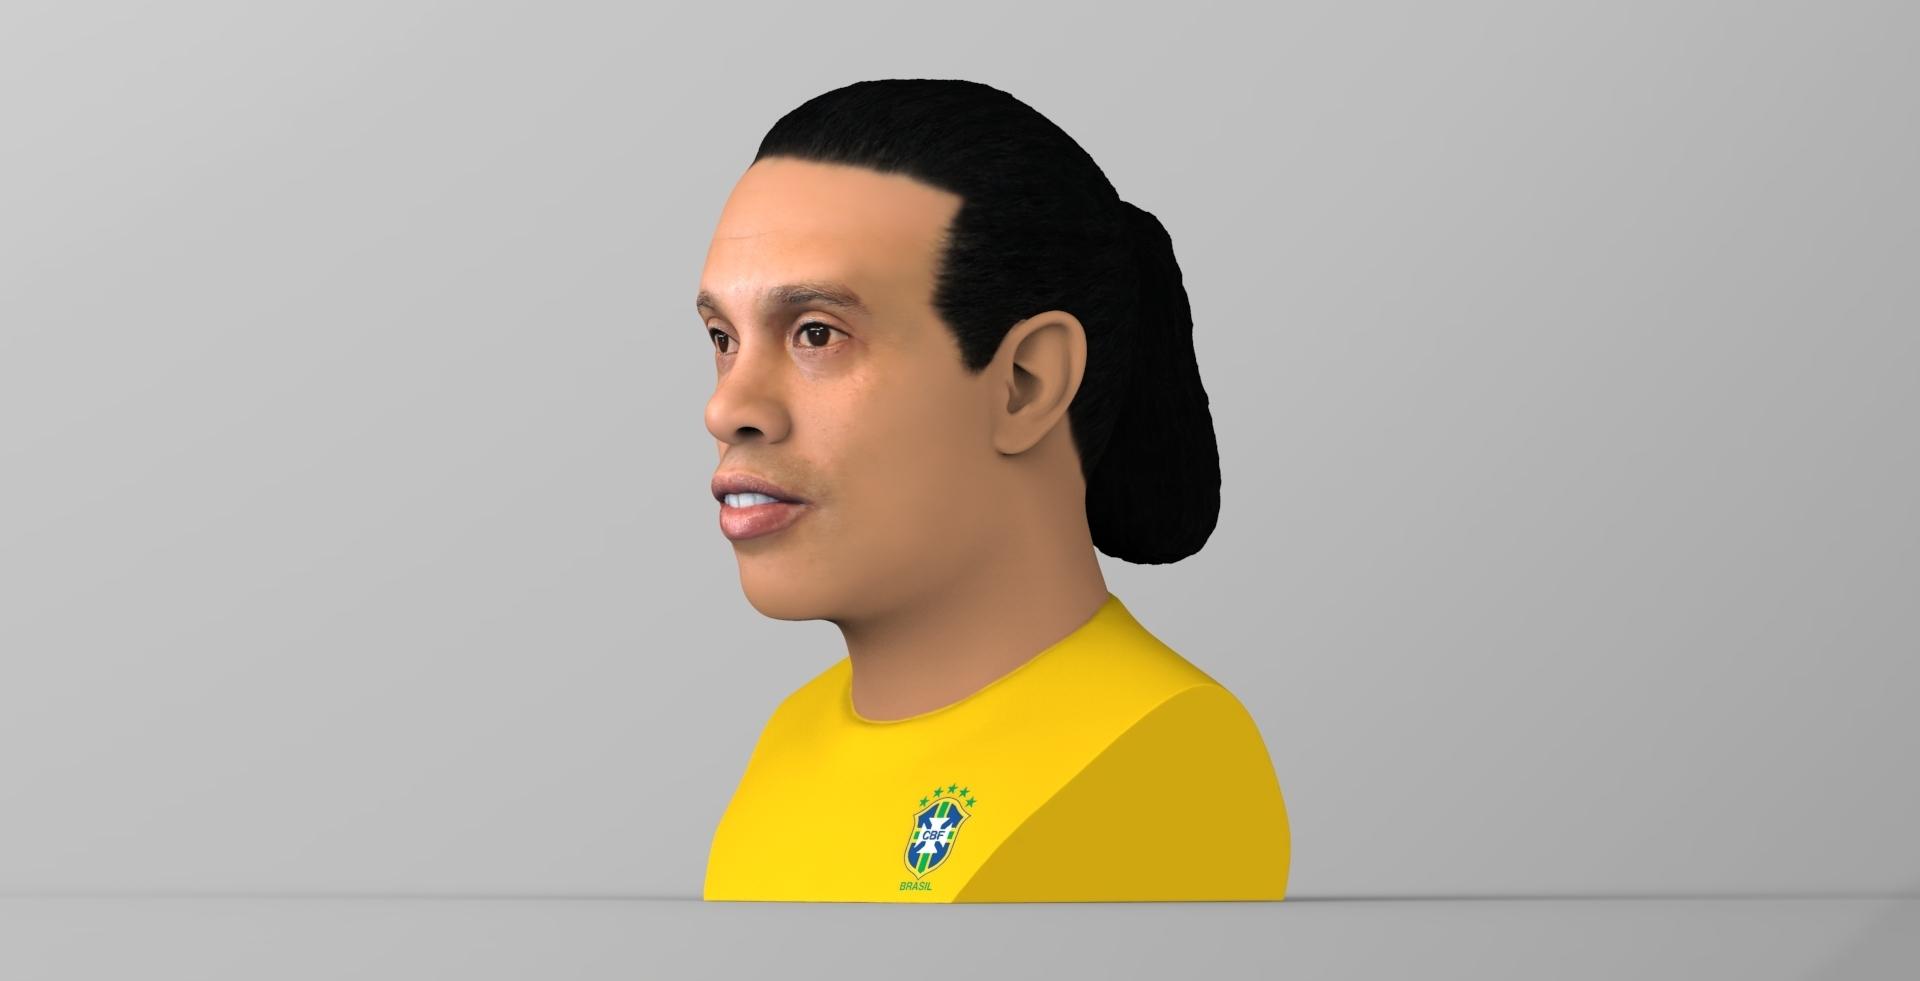 untitled.1681.jpg Download STL file Ronaldinho bust ready for full color 3D printing • 3D print model, PrintedReality